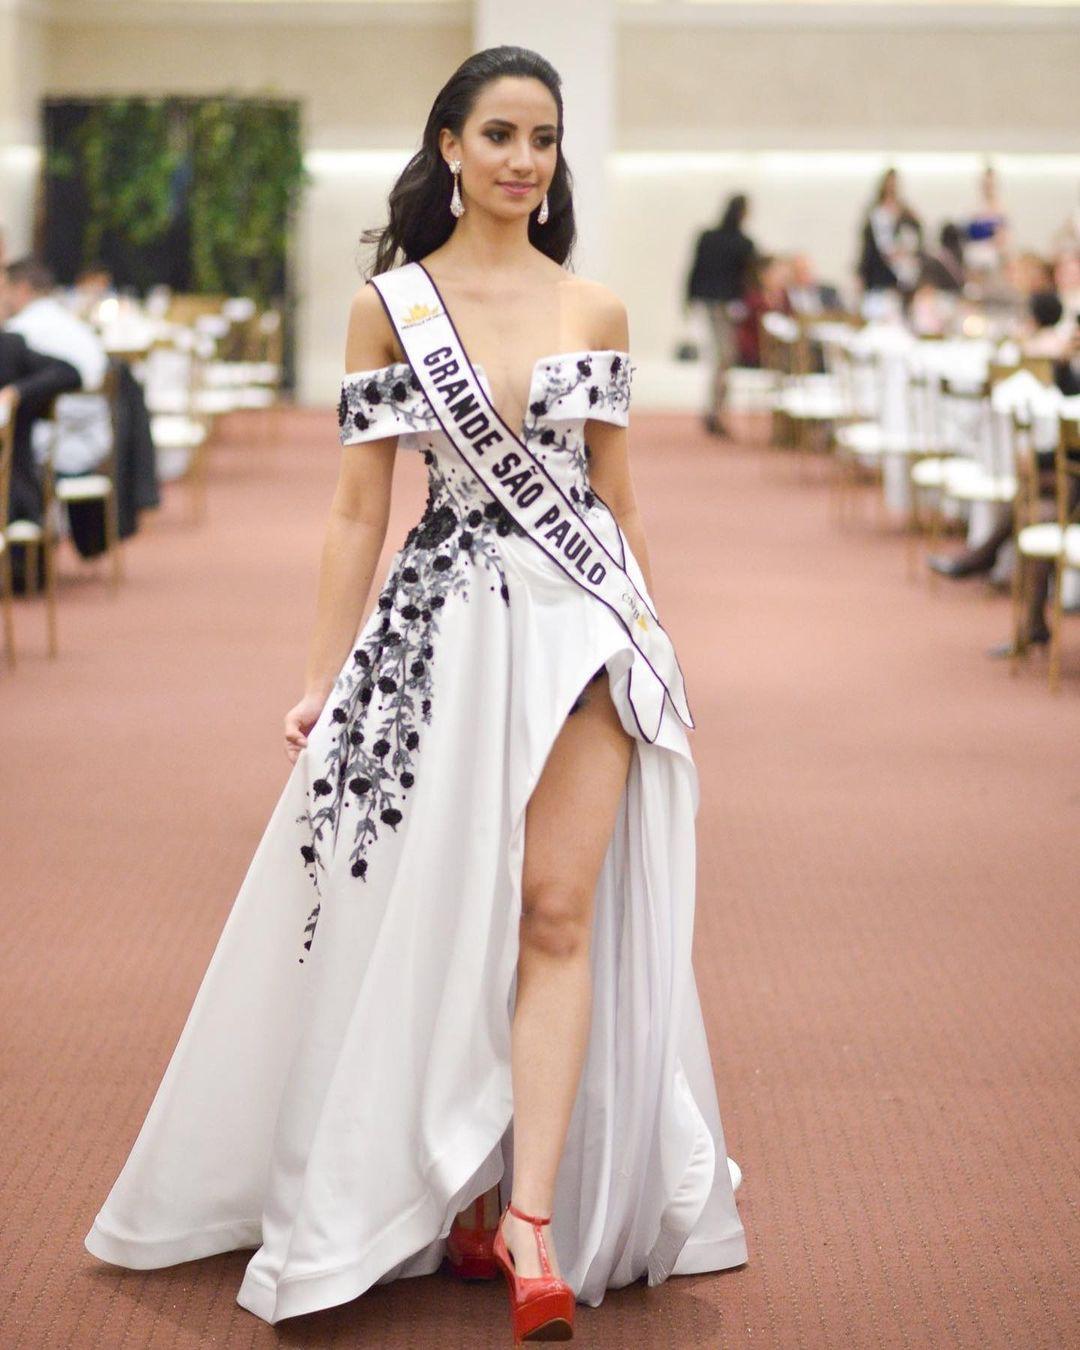 sandy menezes, miss grande sao paulo mundo 2019. - Página 4 Fmu8cp10